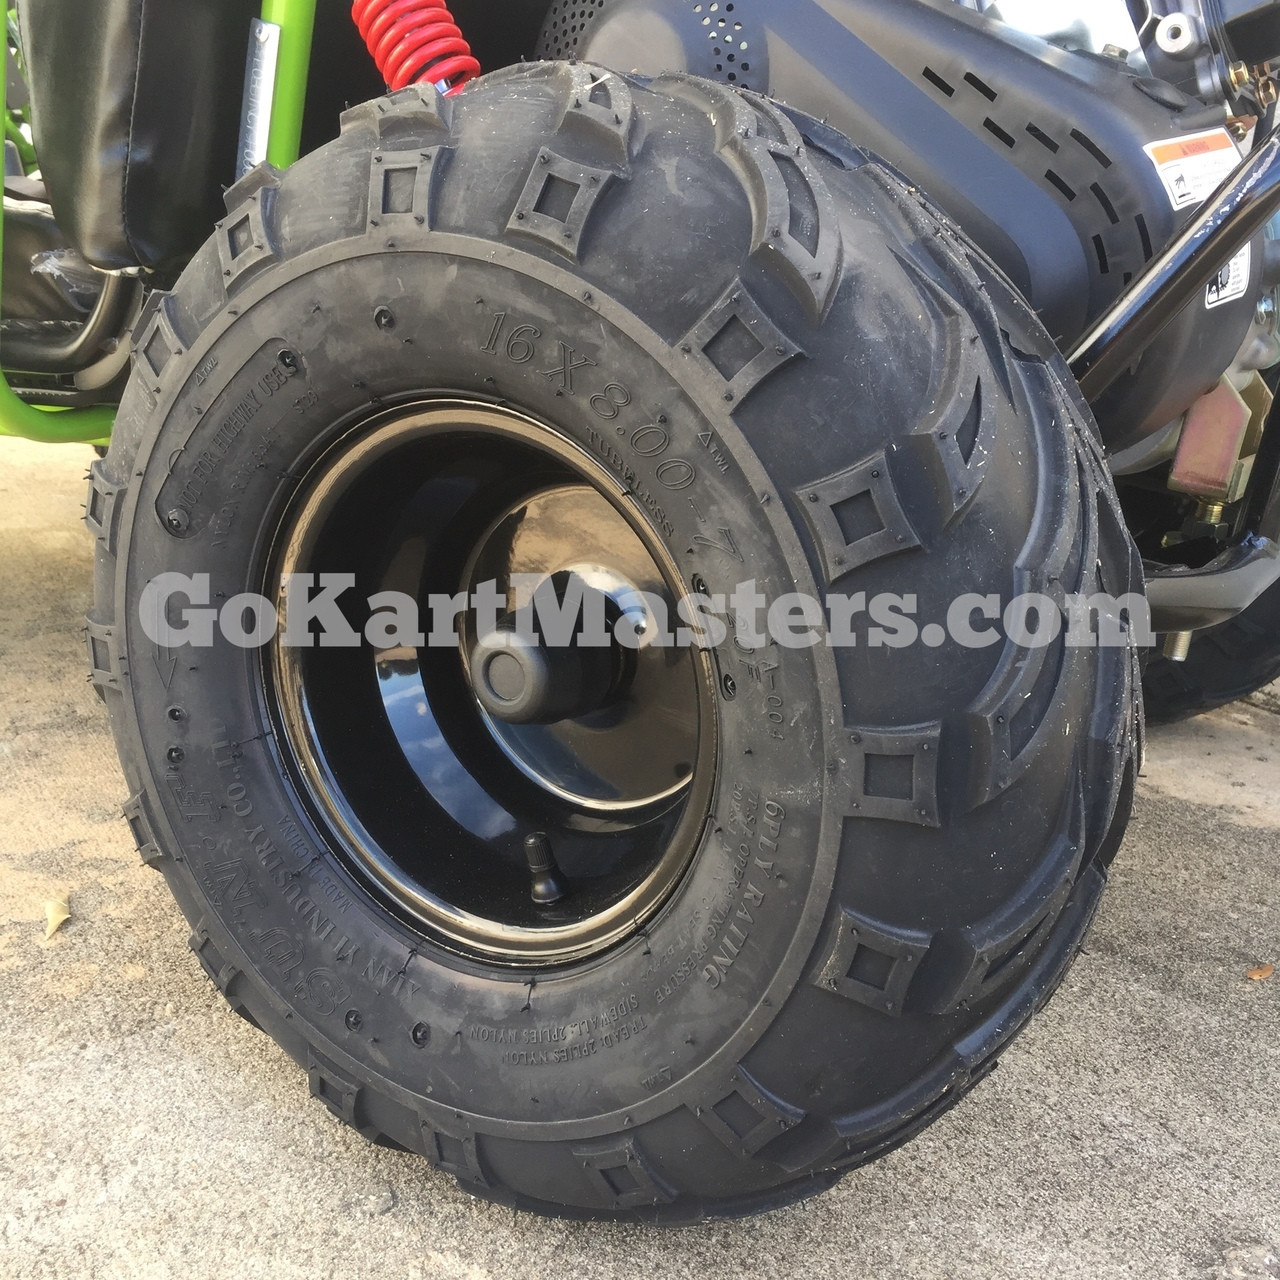 TrailMaster Mini XRX/R+ Go Kart - Oversize Tires